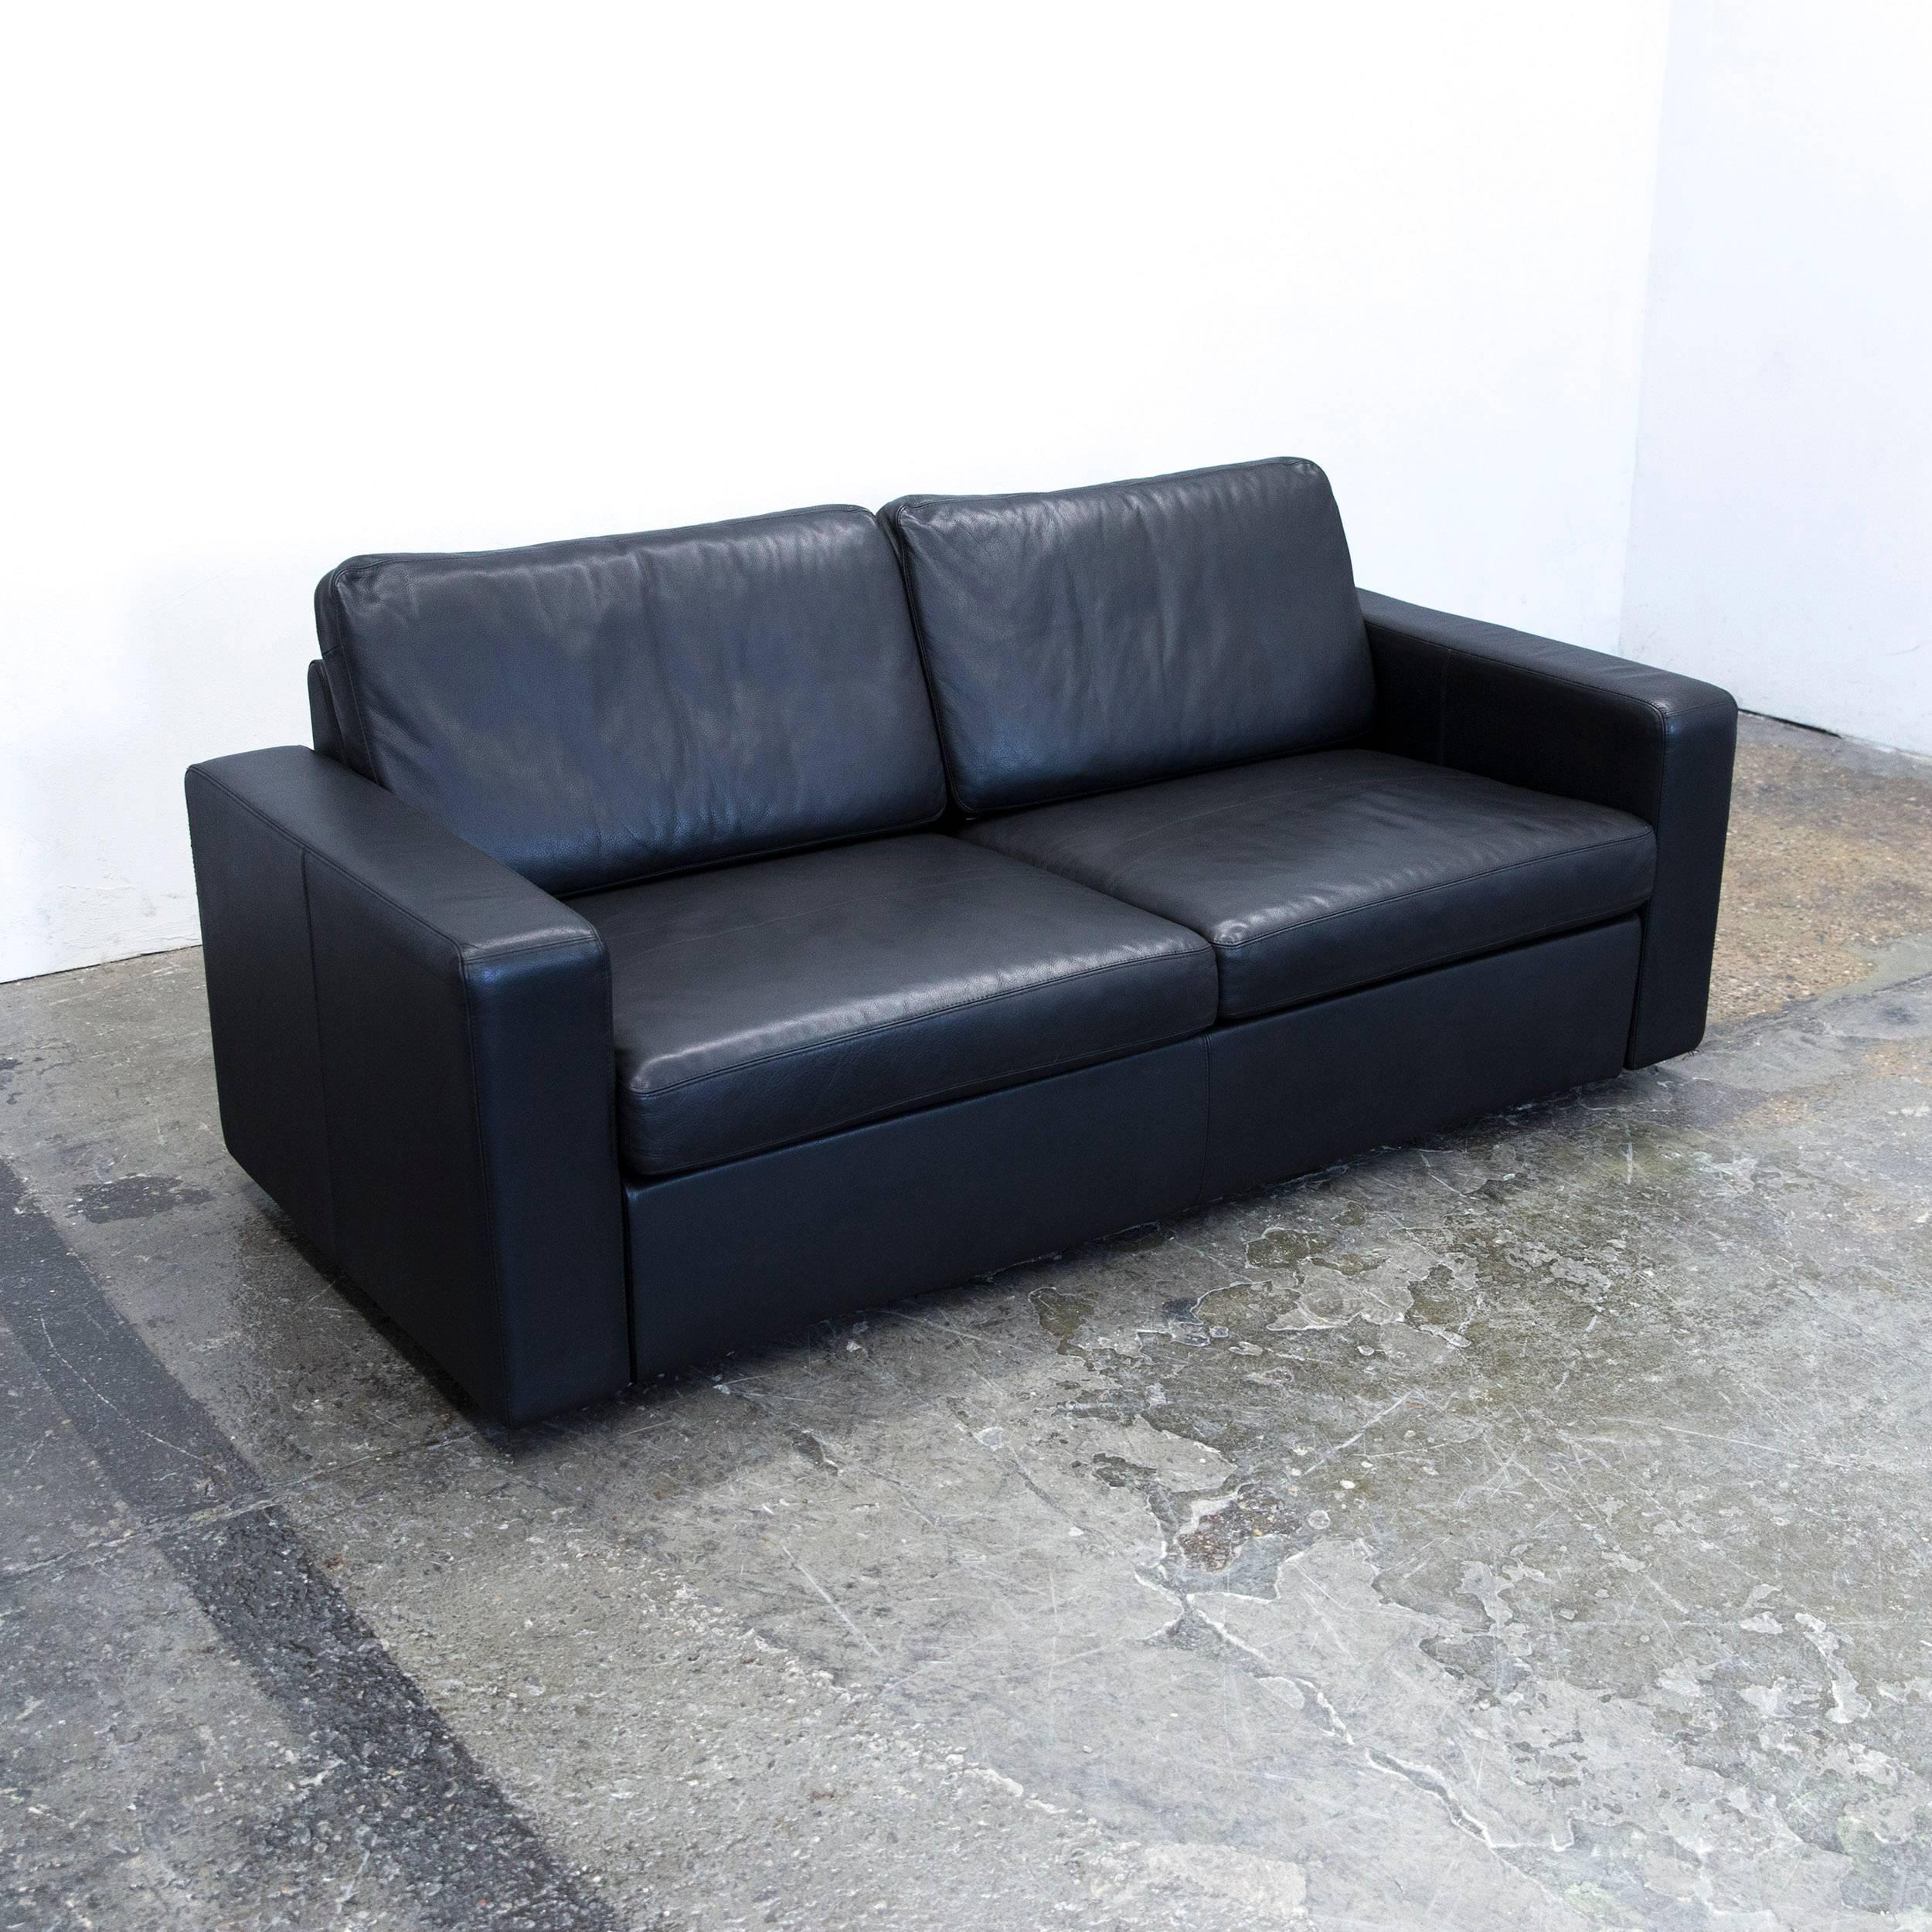 Cor Conseta Designer Sofa Leather Black Sleepsofa Three Seat Couch Modern